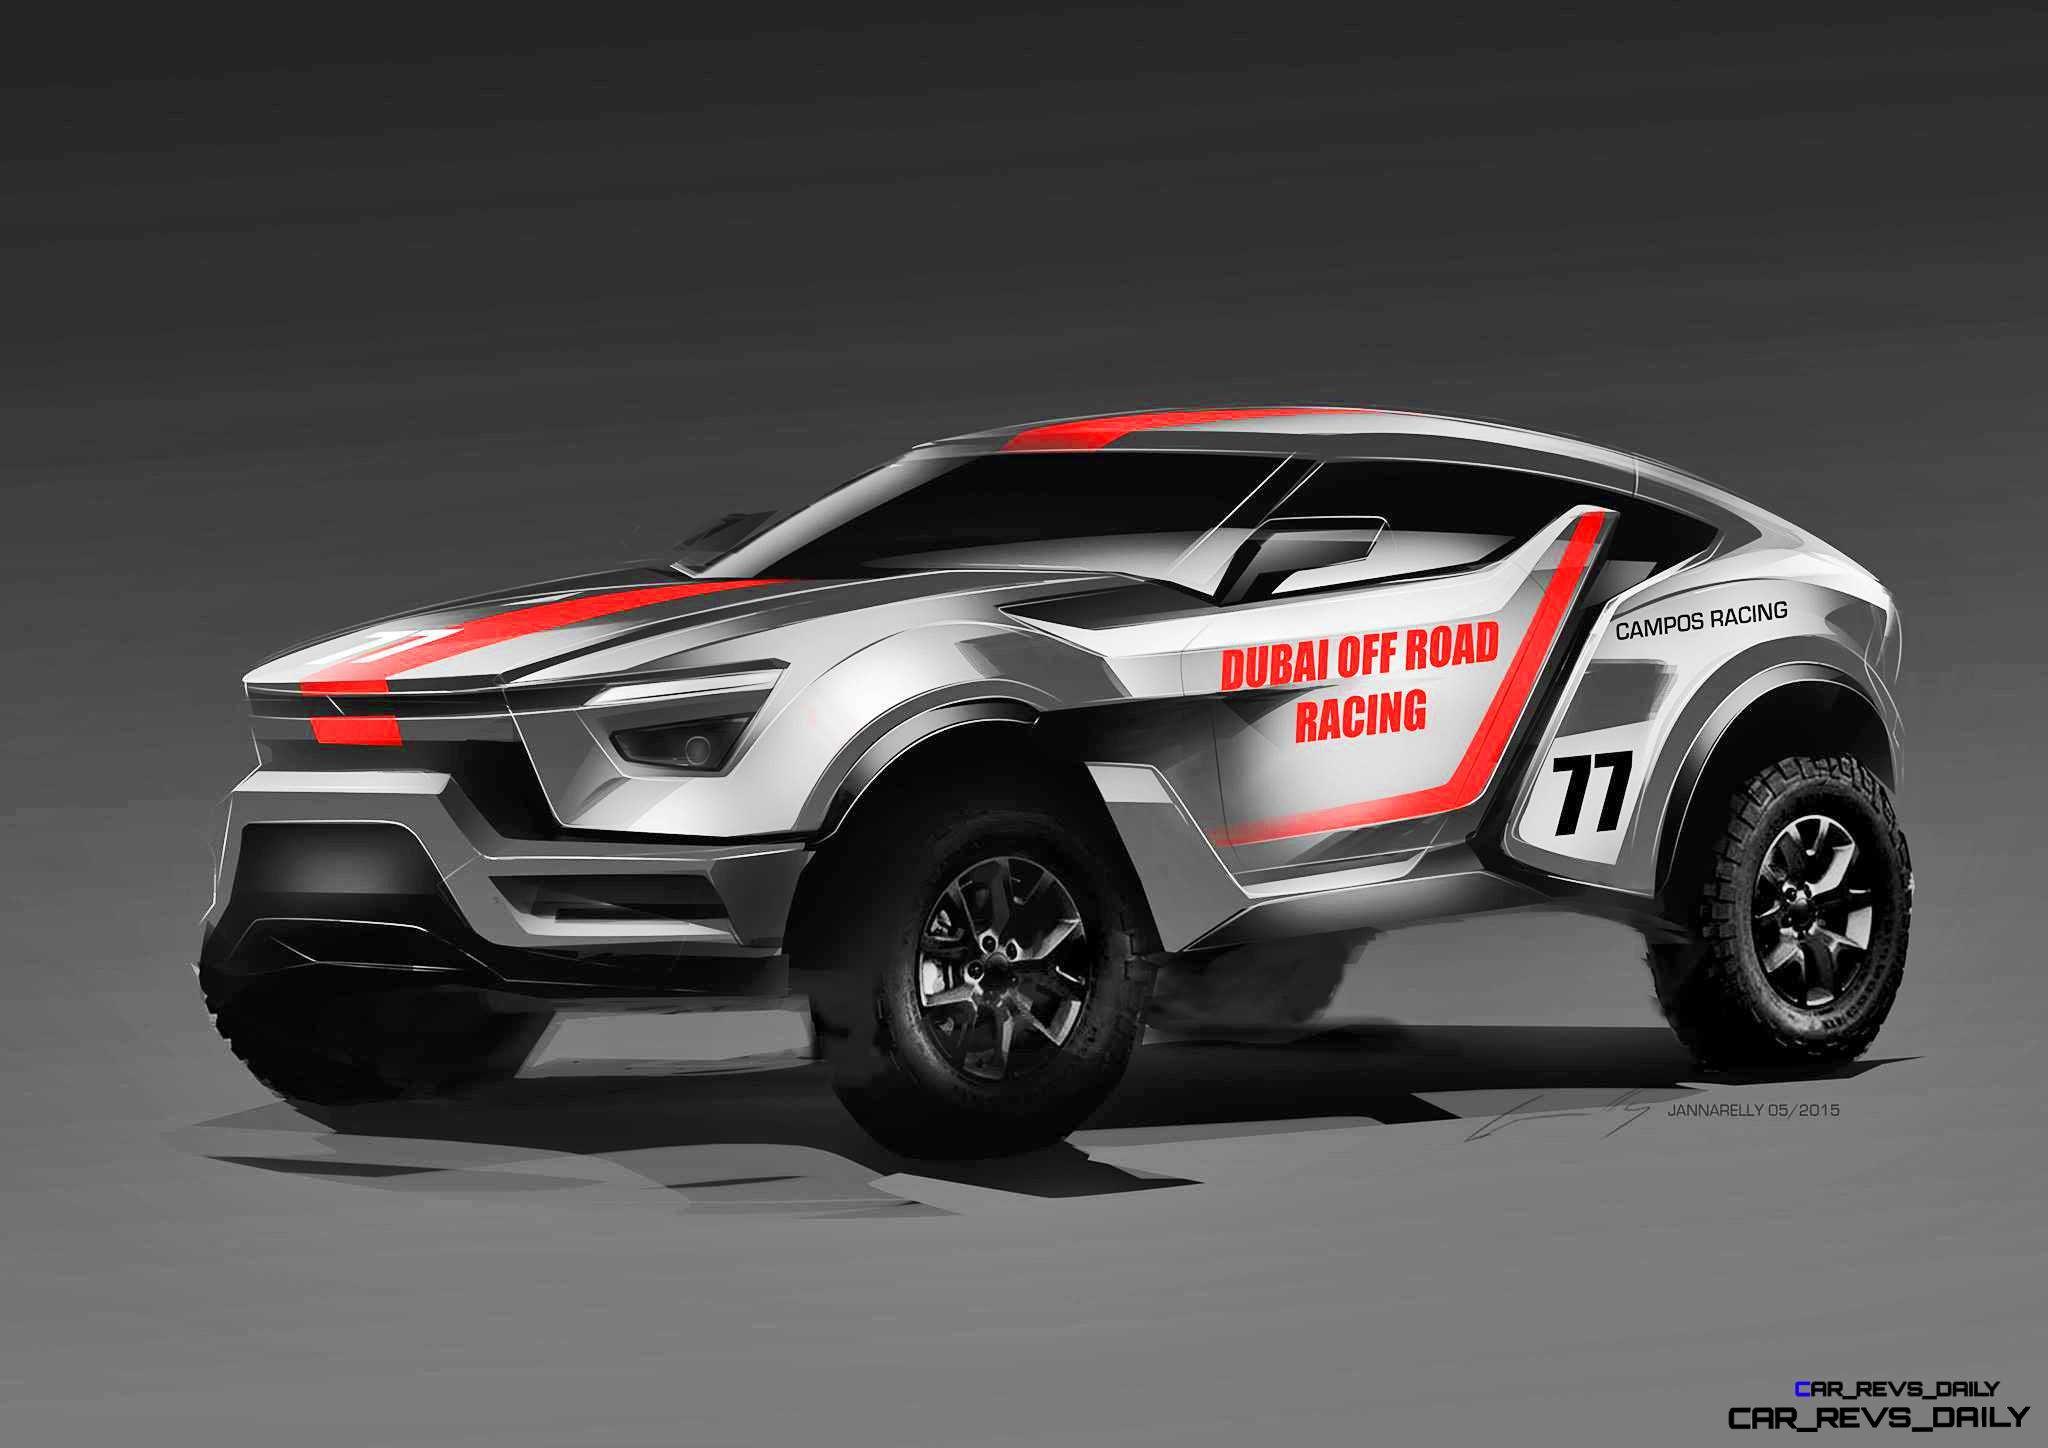 2017 Zarooq Sand Racer – a 500HP DAKAR LYKAN?